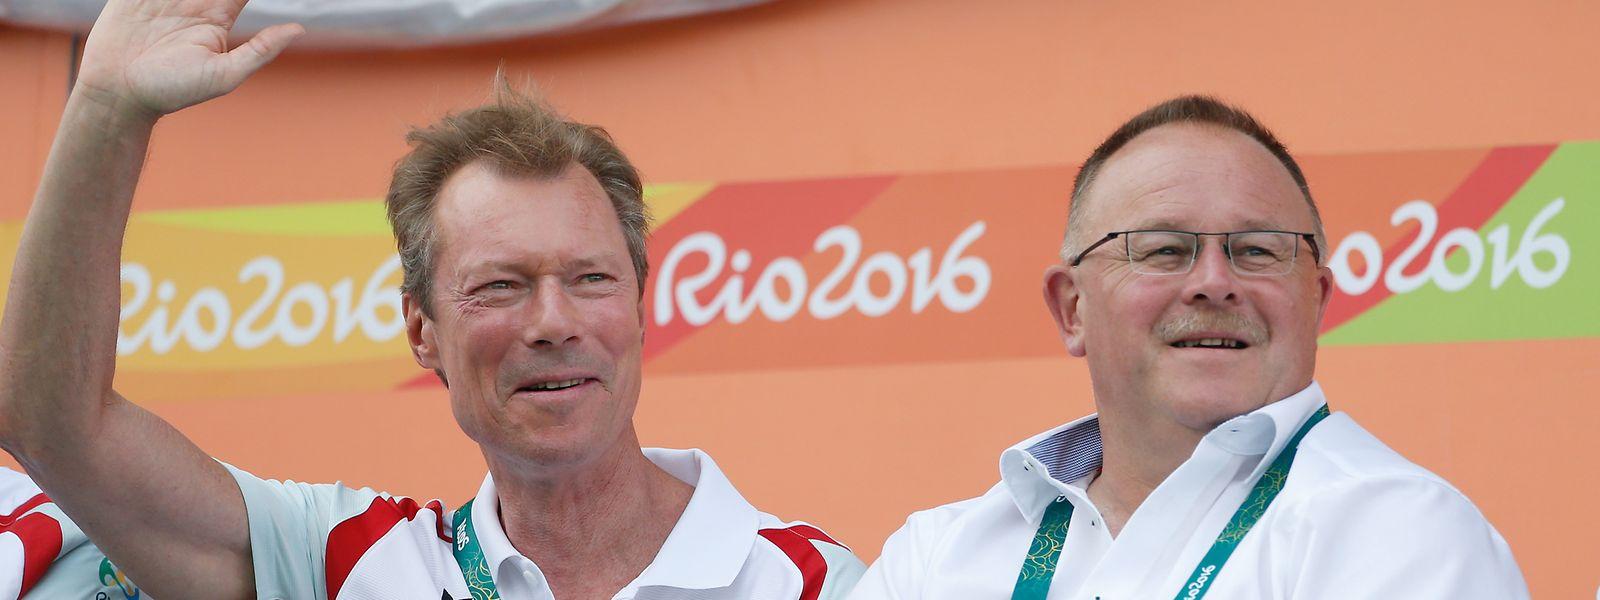 Olympia 2016: Grand-Duc Henri (l.) schaut sich an der Seite des damaligen Sportministers Romain Schneider das Tennismatch zwischen Gilles Muller und Jo-Wilfried Tsonga an.